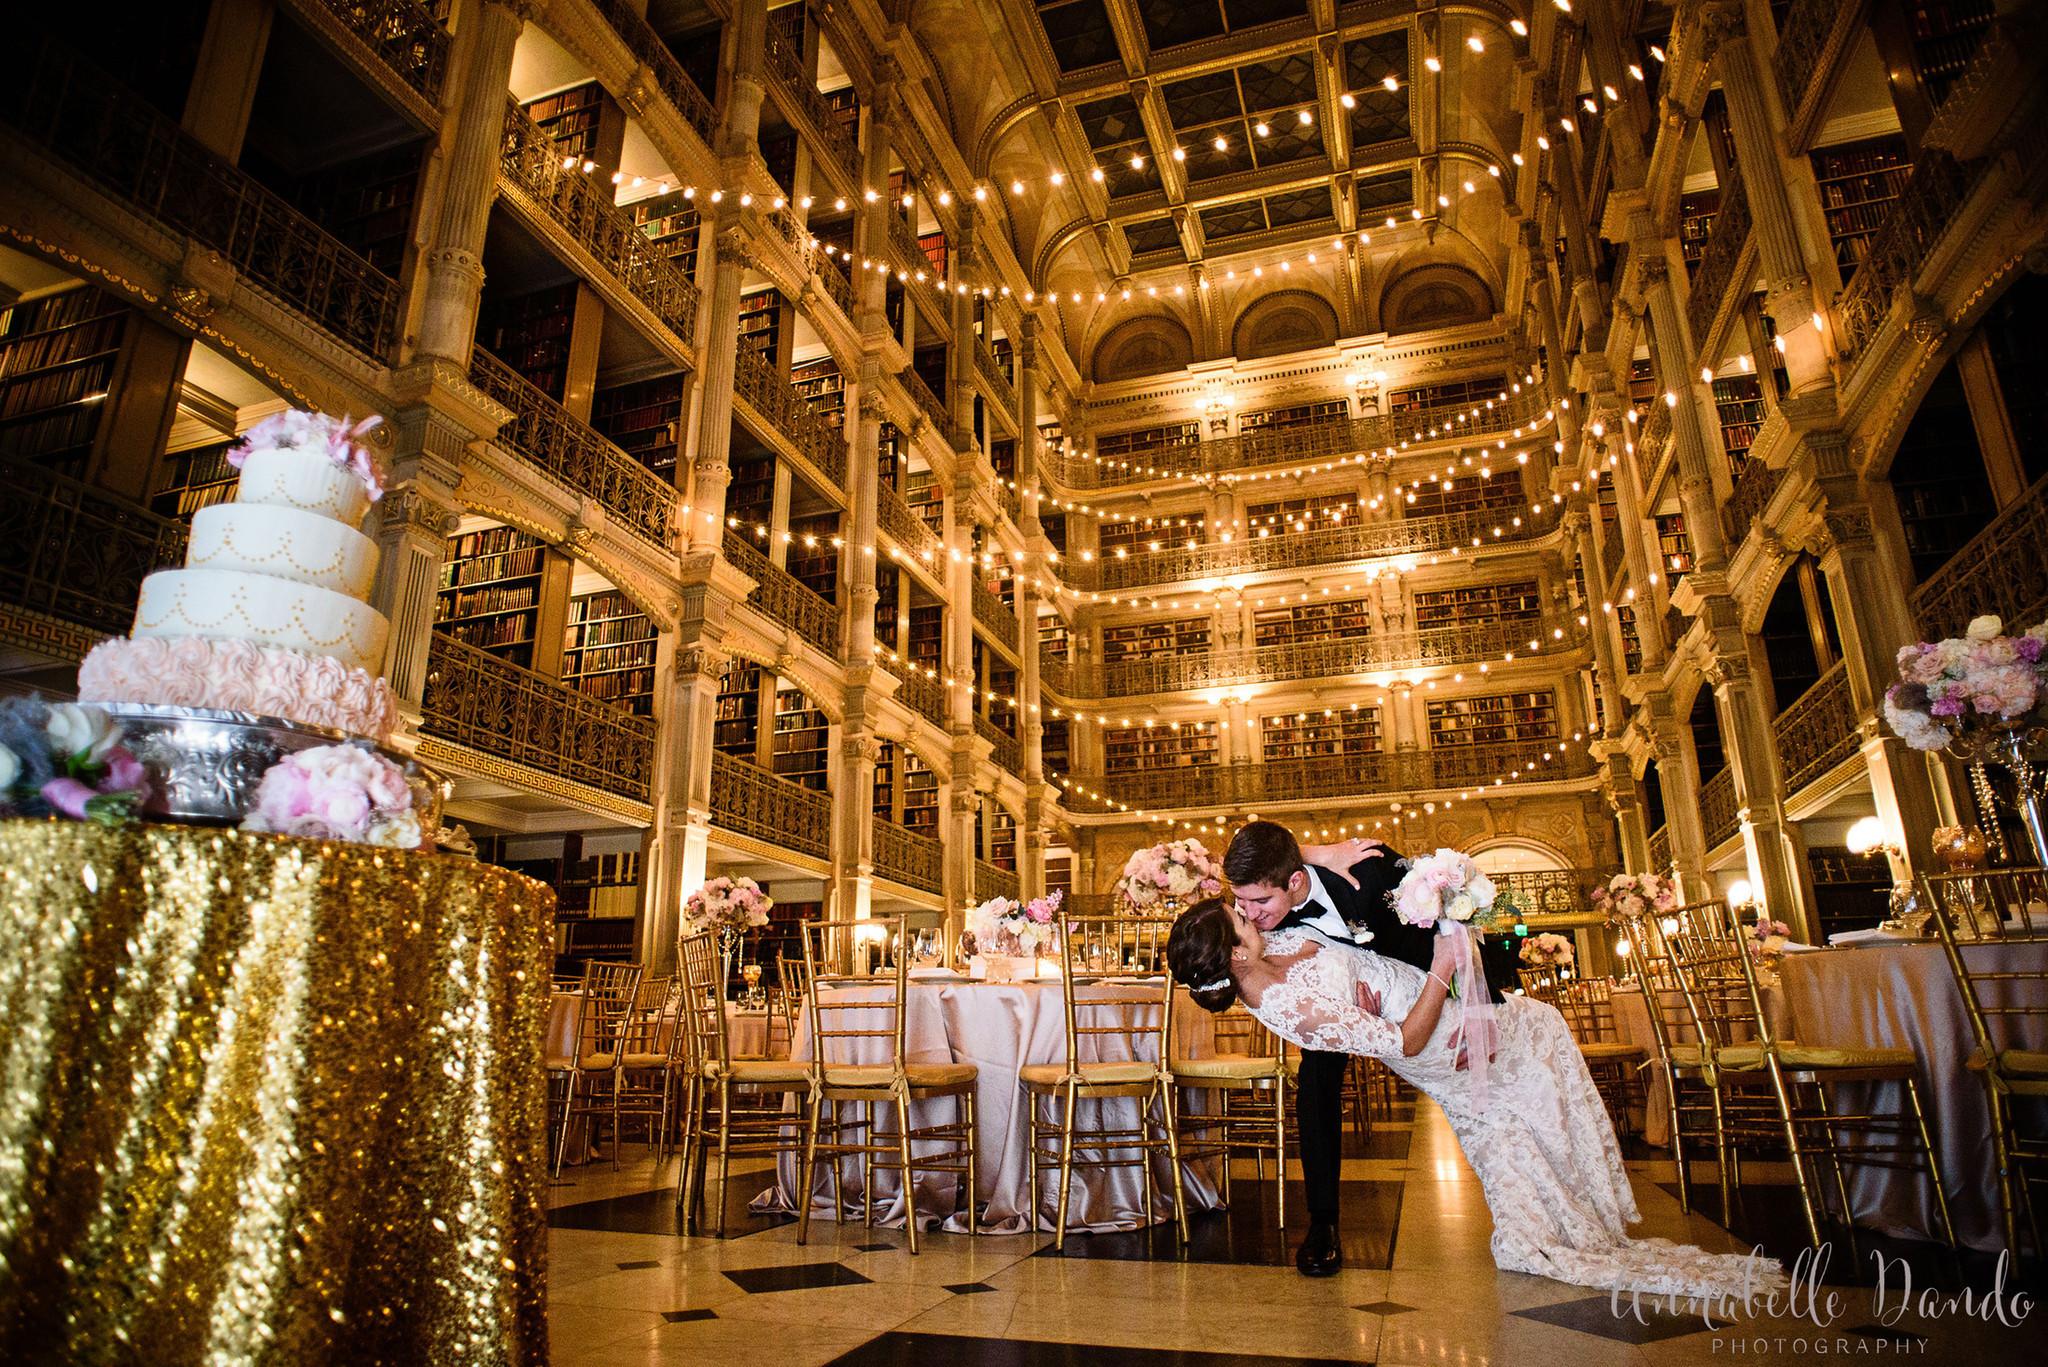 Top Wedding Venues In The Baltimore Area Baltimore Sun